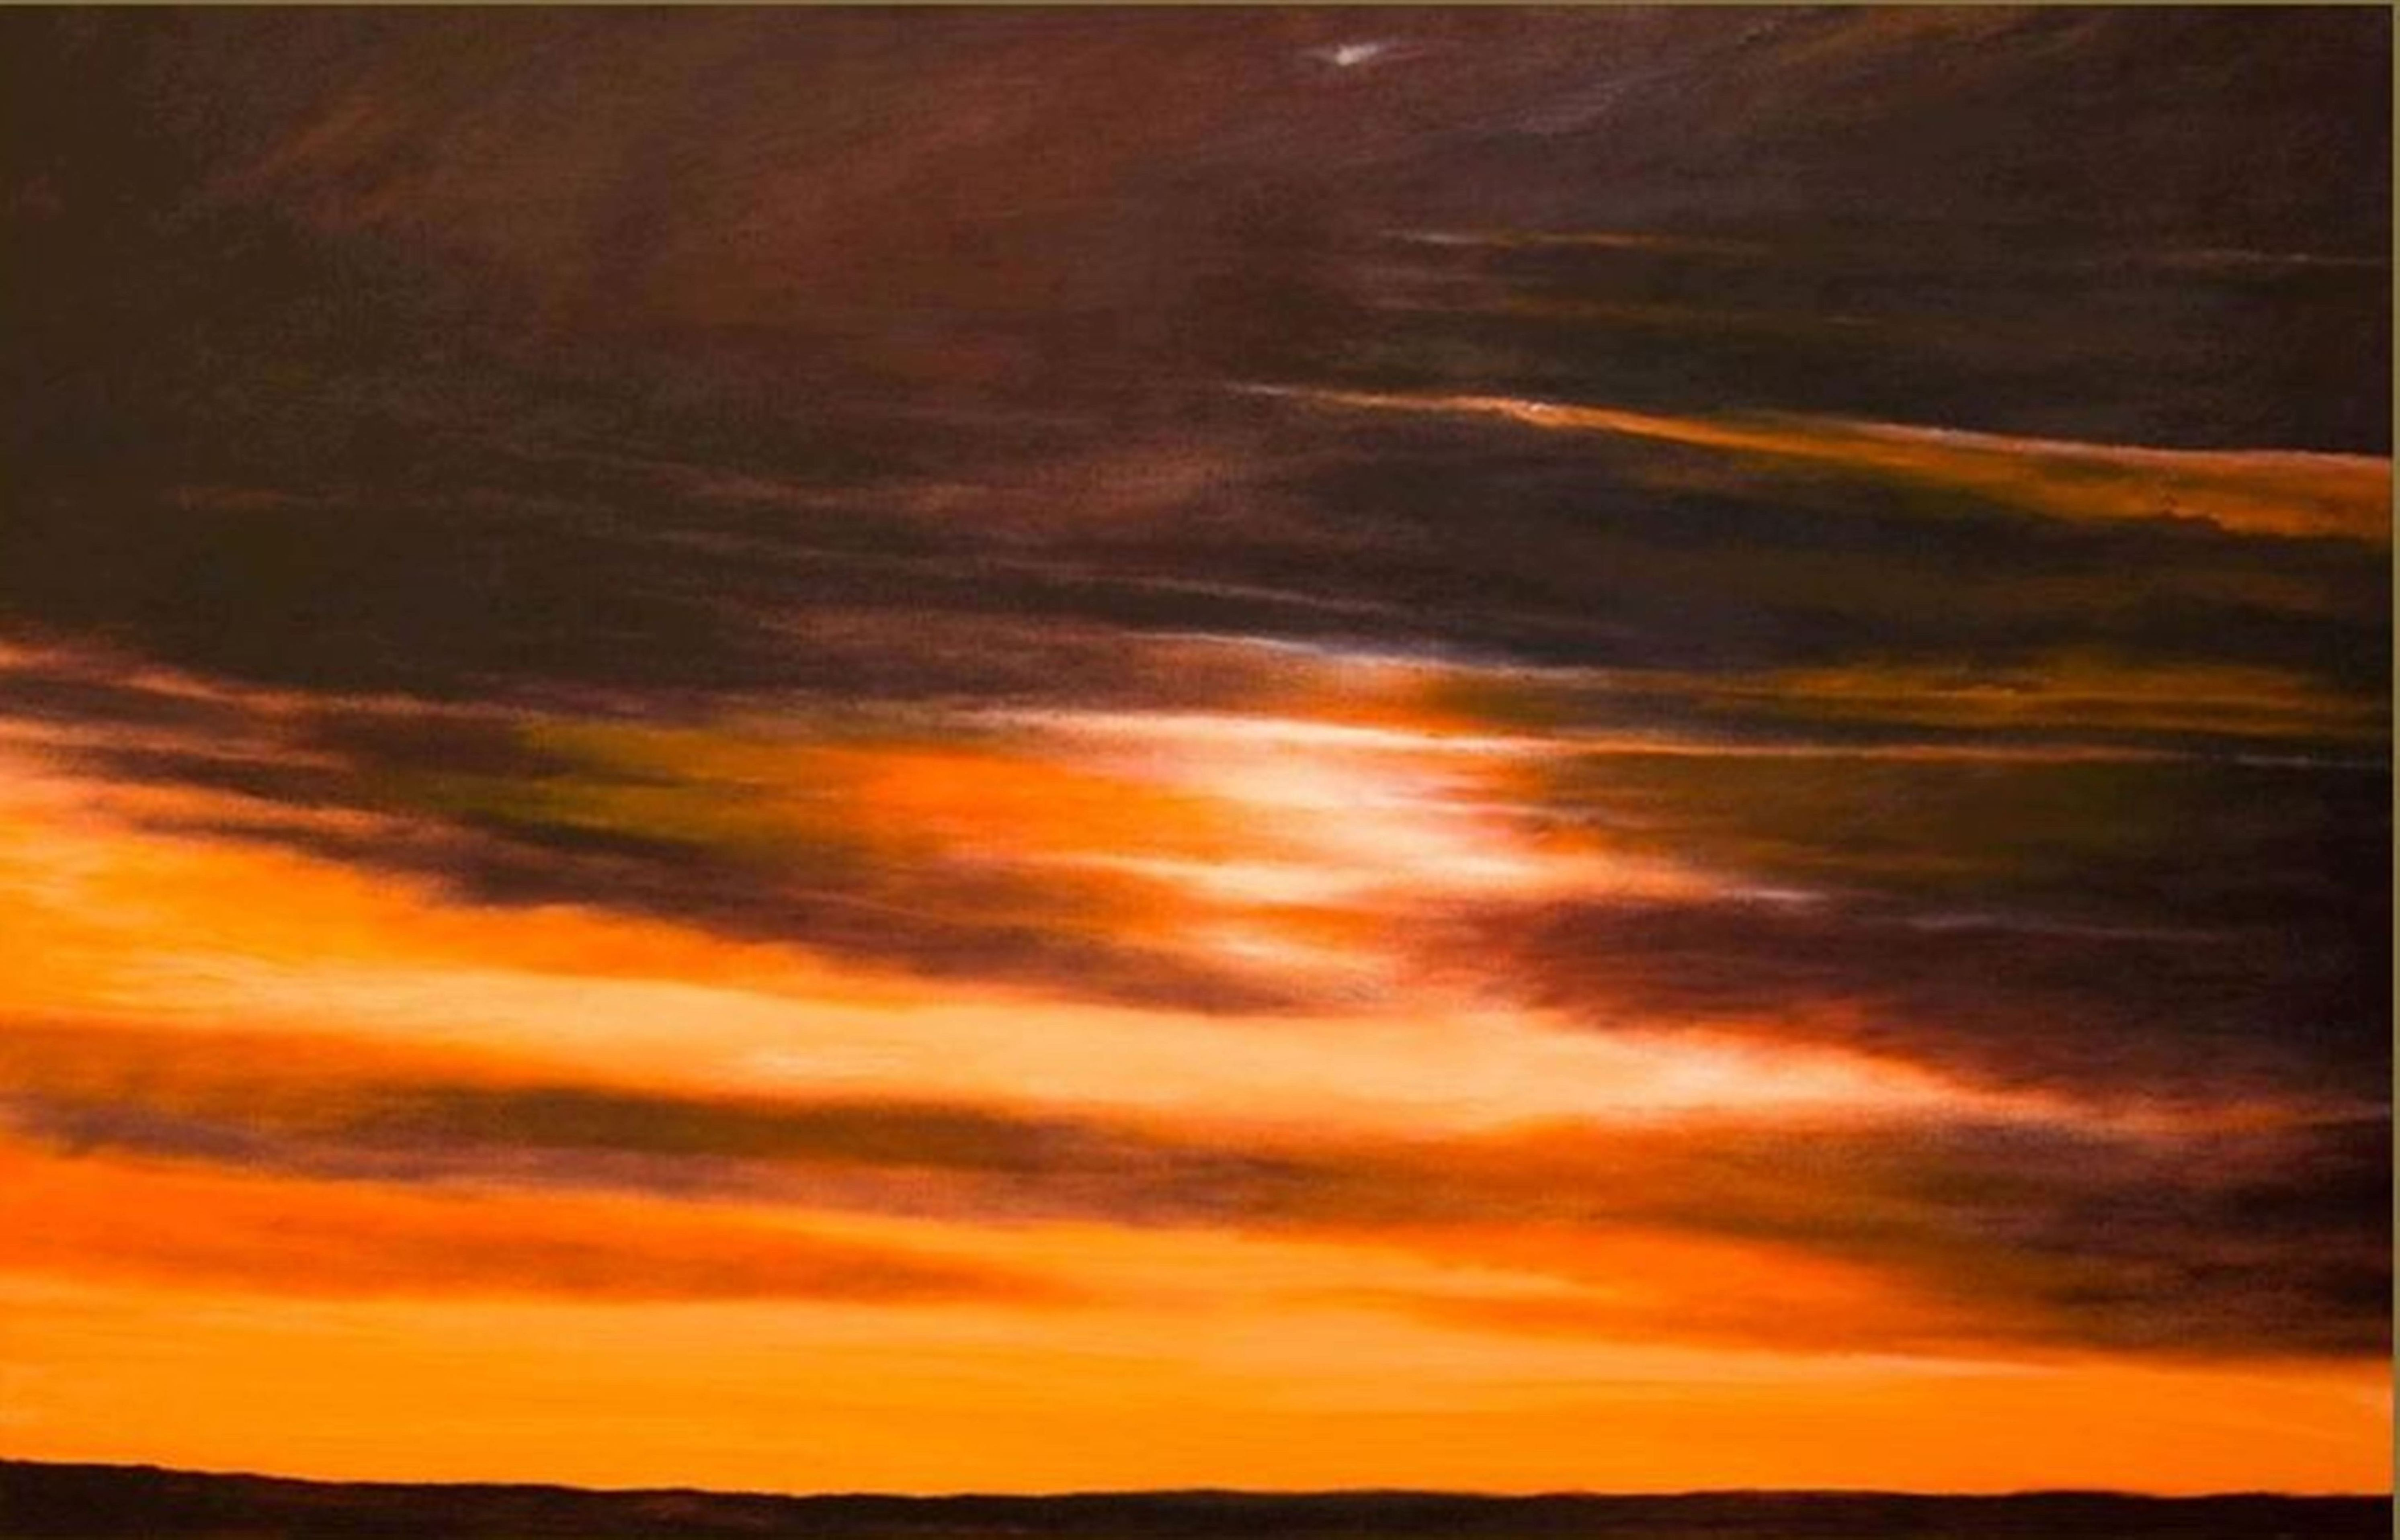 MIDNIGHT SUN (2018) - Cecilia Flatten